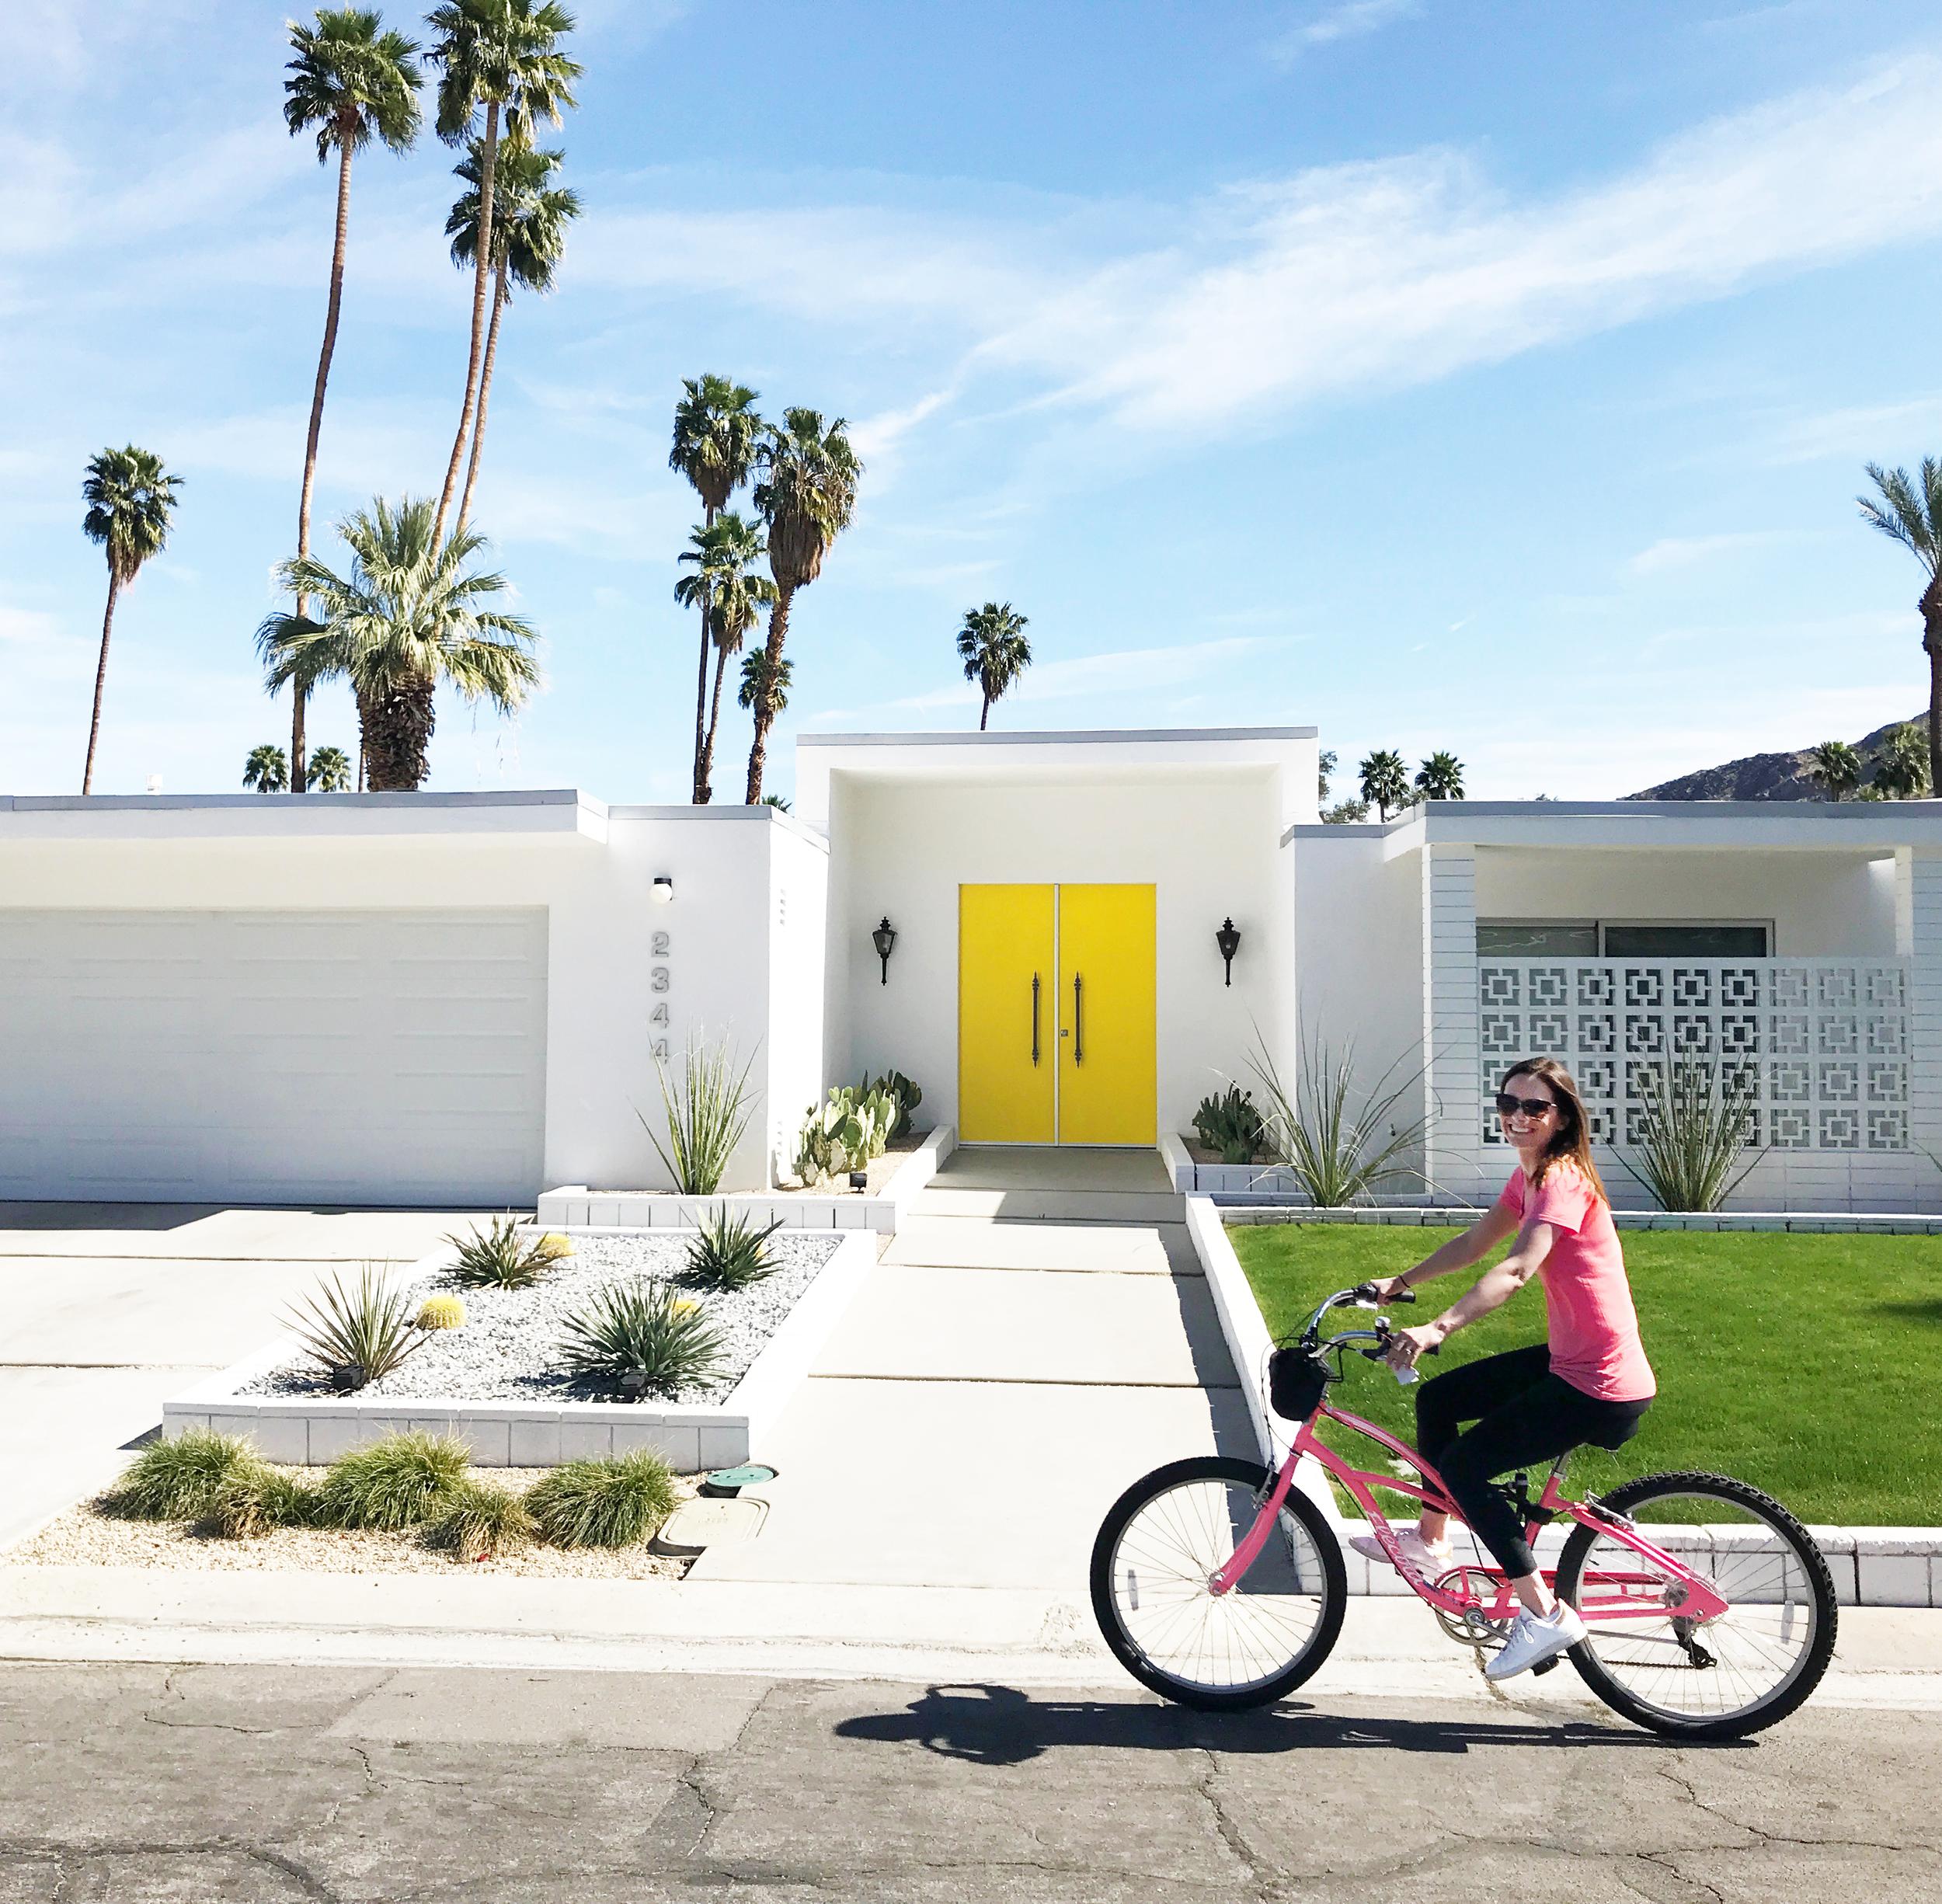 Palm_Springs_Bike.png